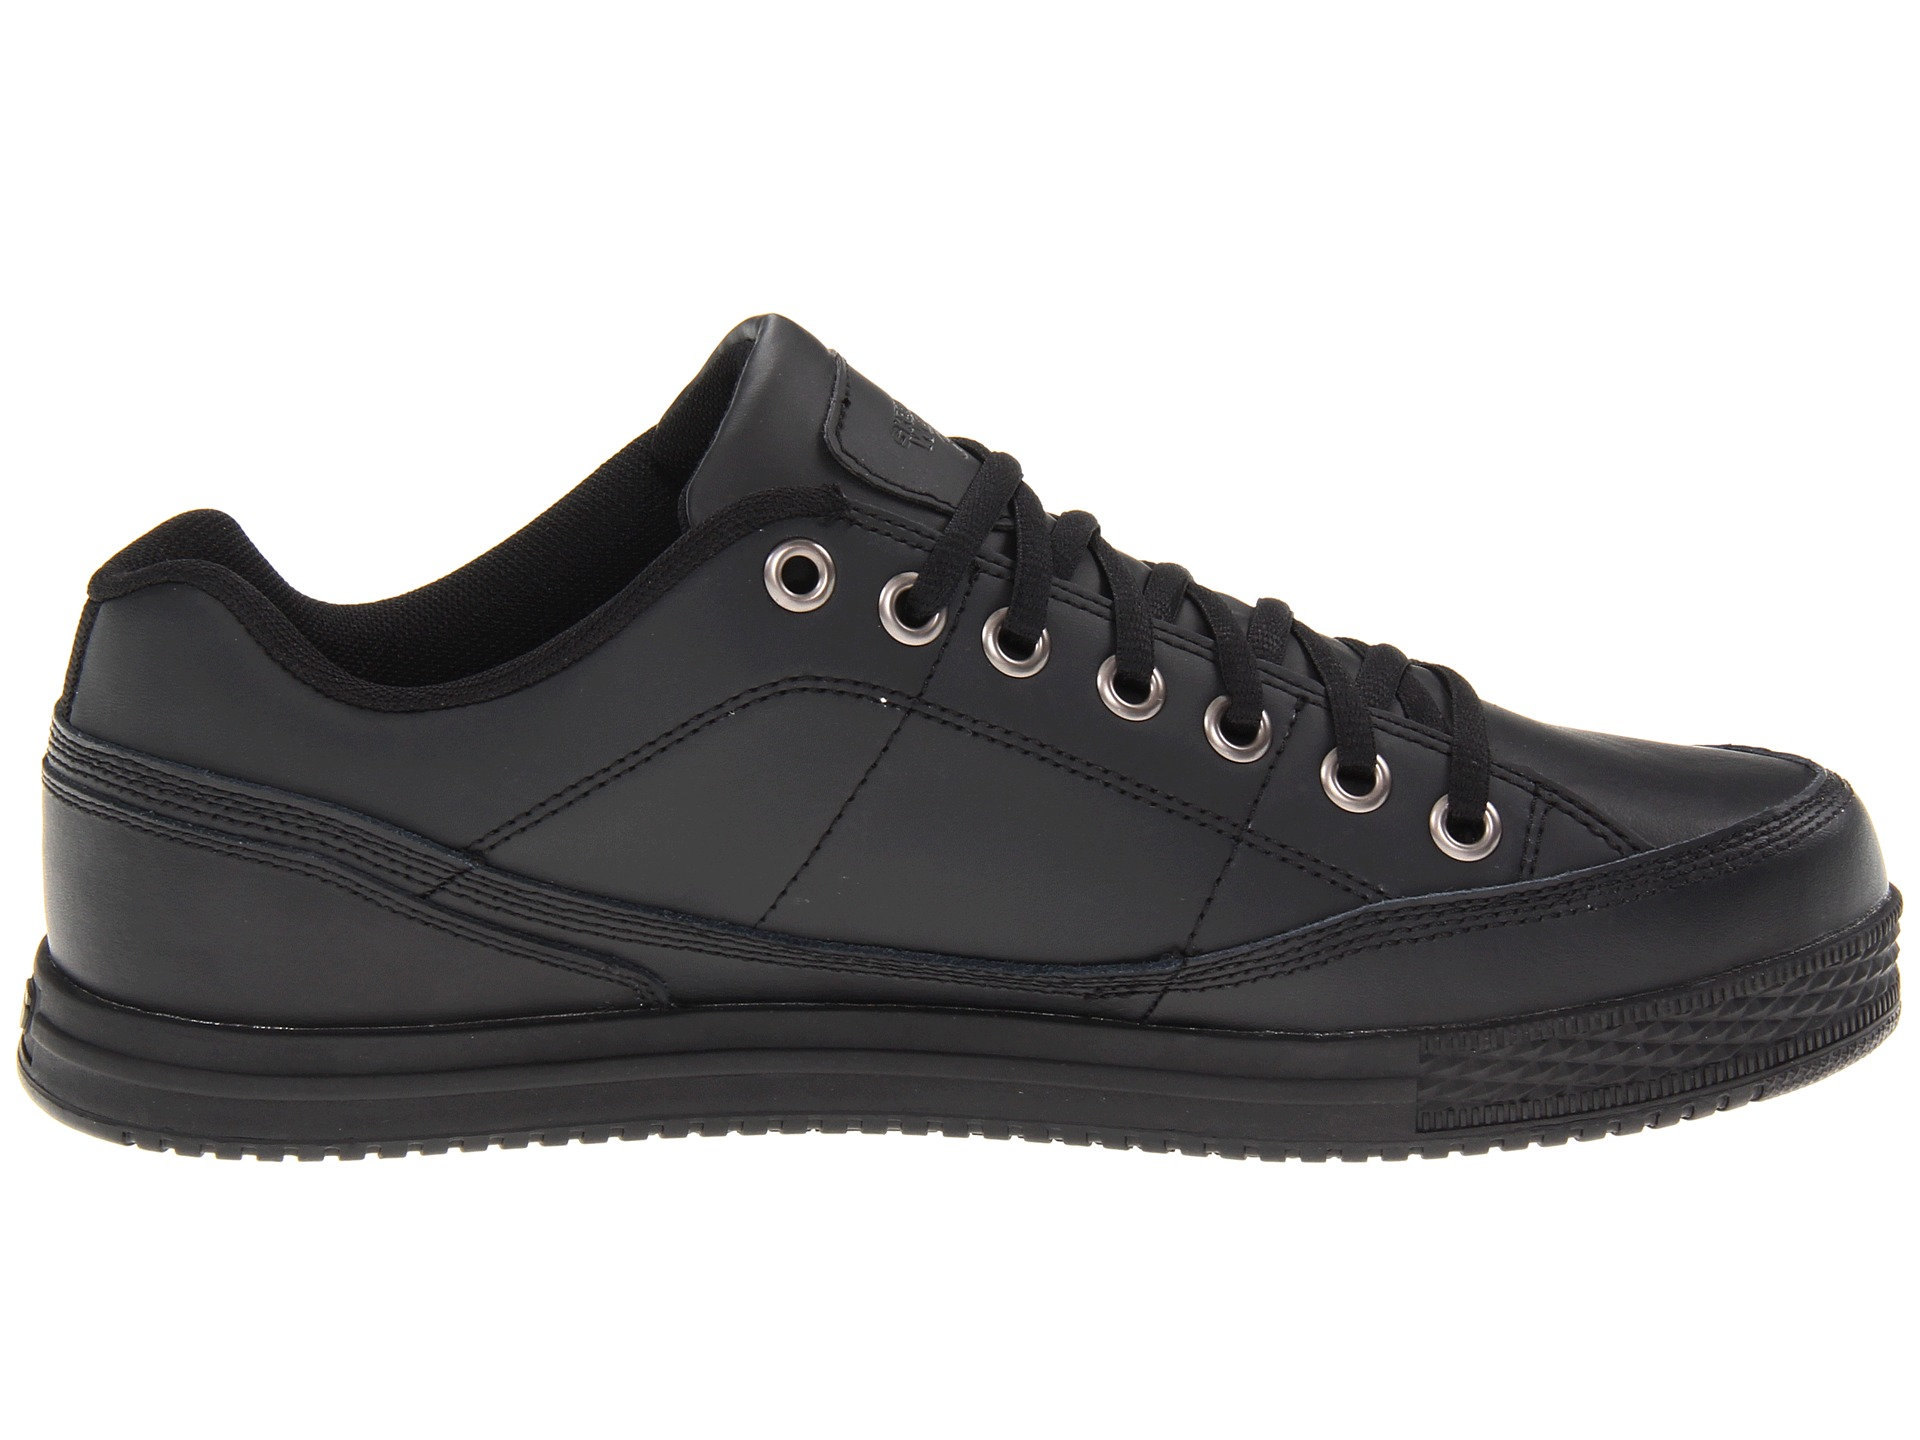 skechers work lace up slip resistant sneaker zappos